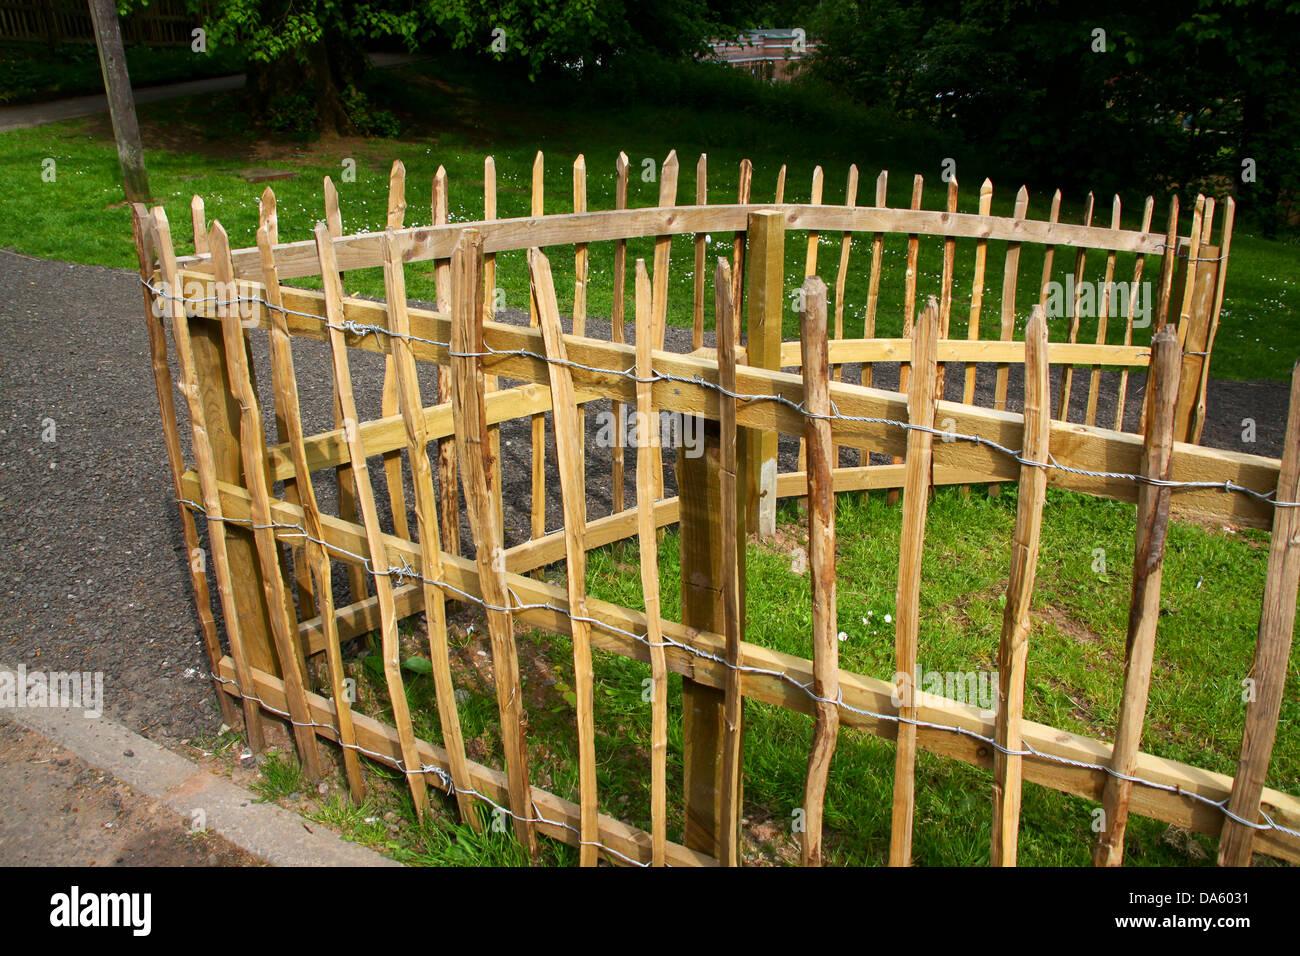 Split hazel wood and wire palisade fence stock photo royalty free split hazel wood and wire palisade fence stock photo baanklon Gallery